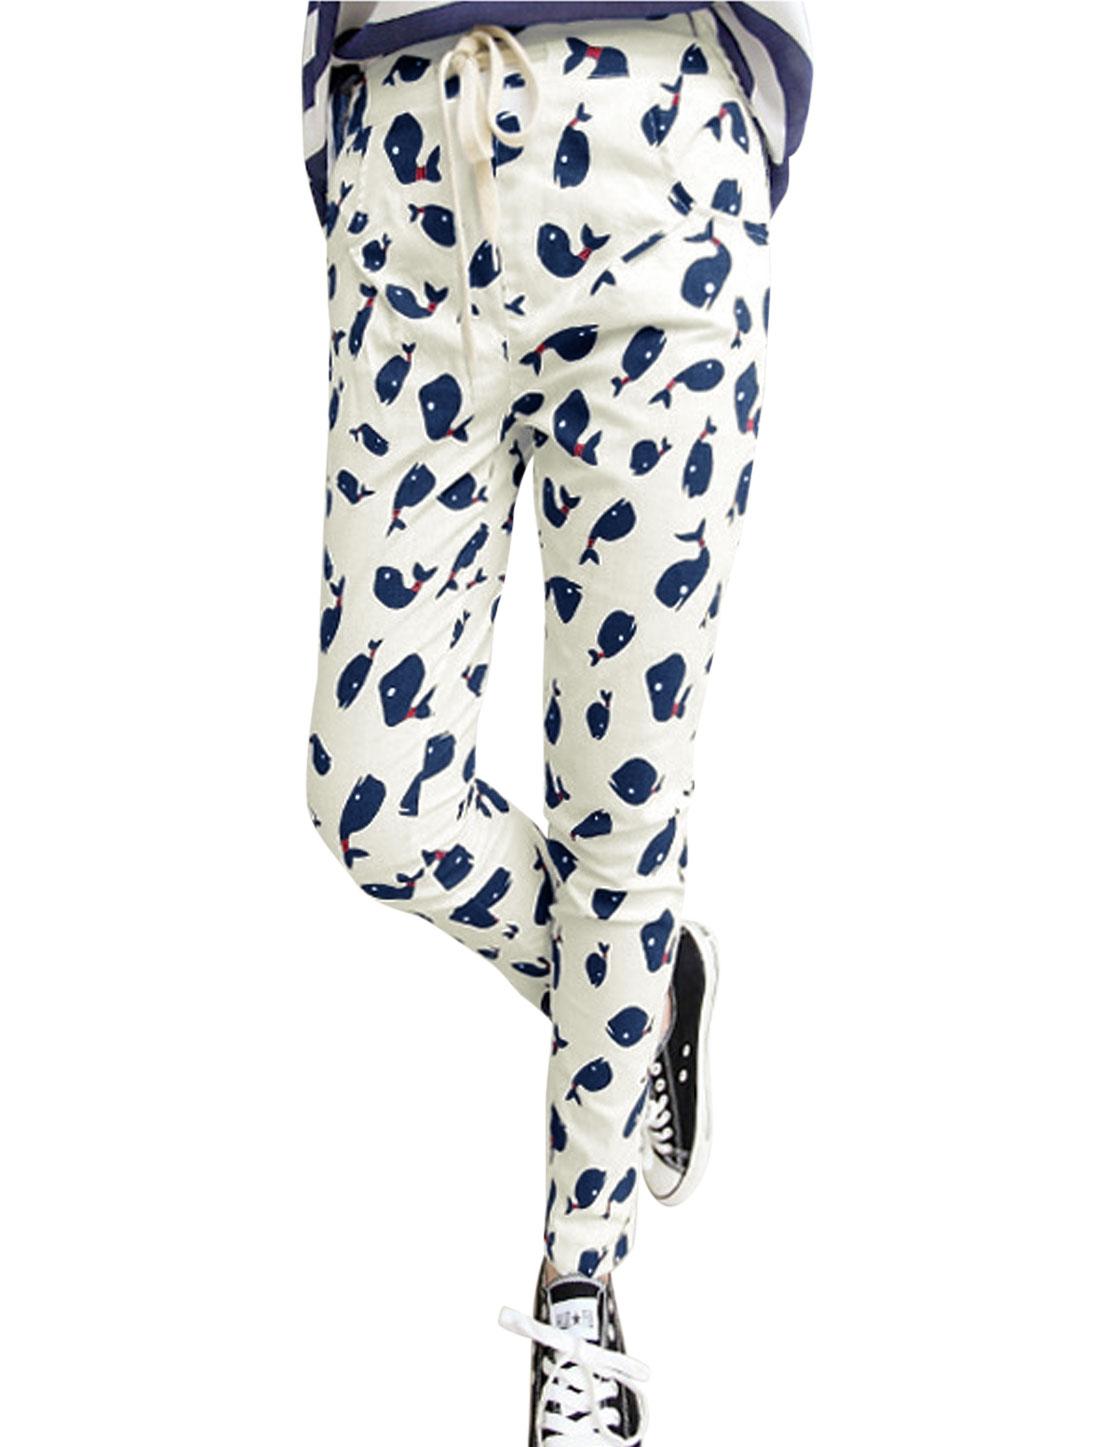 Lady White Mid Rise Drawstring Elastic Waist Back Dolphin Prints Pants M